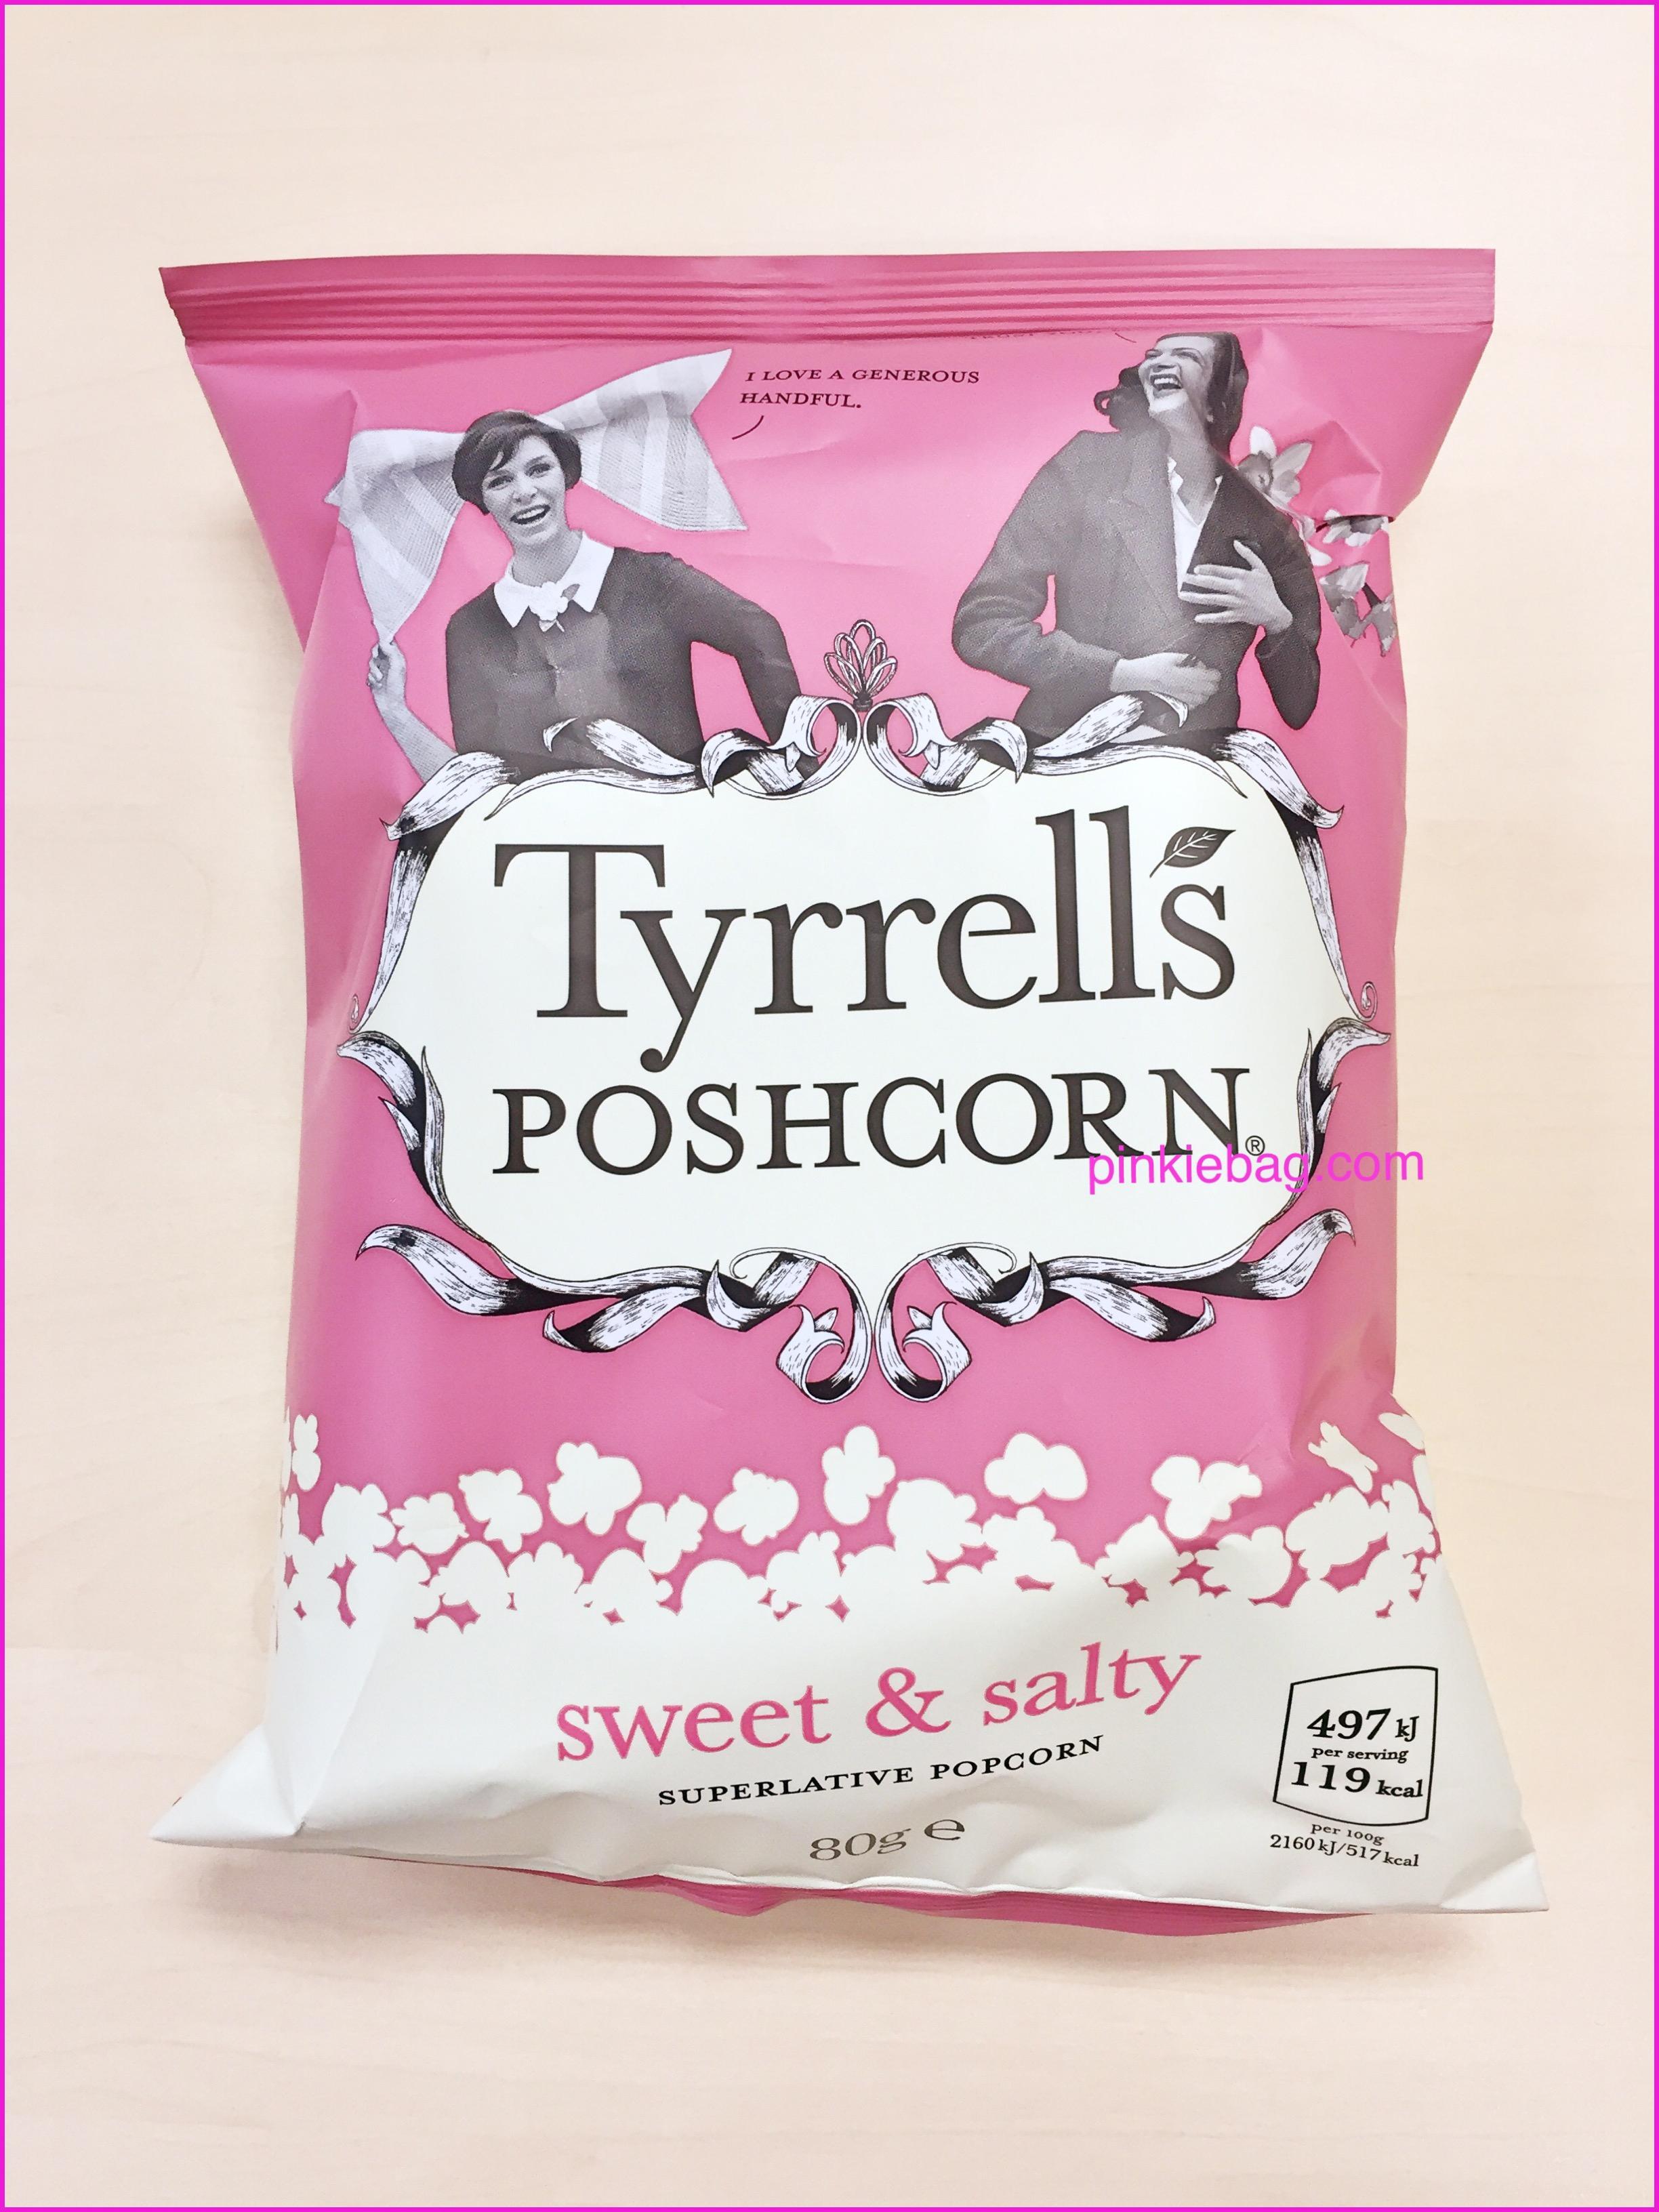 Tyrell's PoshCorn Sweet & Salty 80g Popcorn 49p in Heron